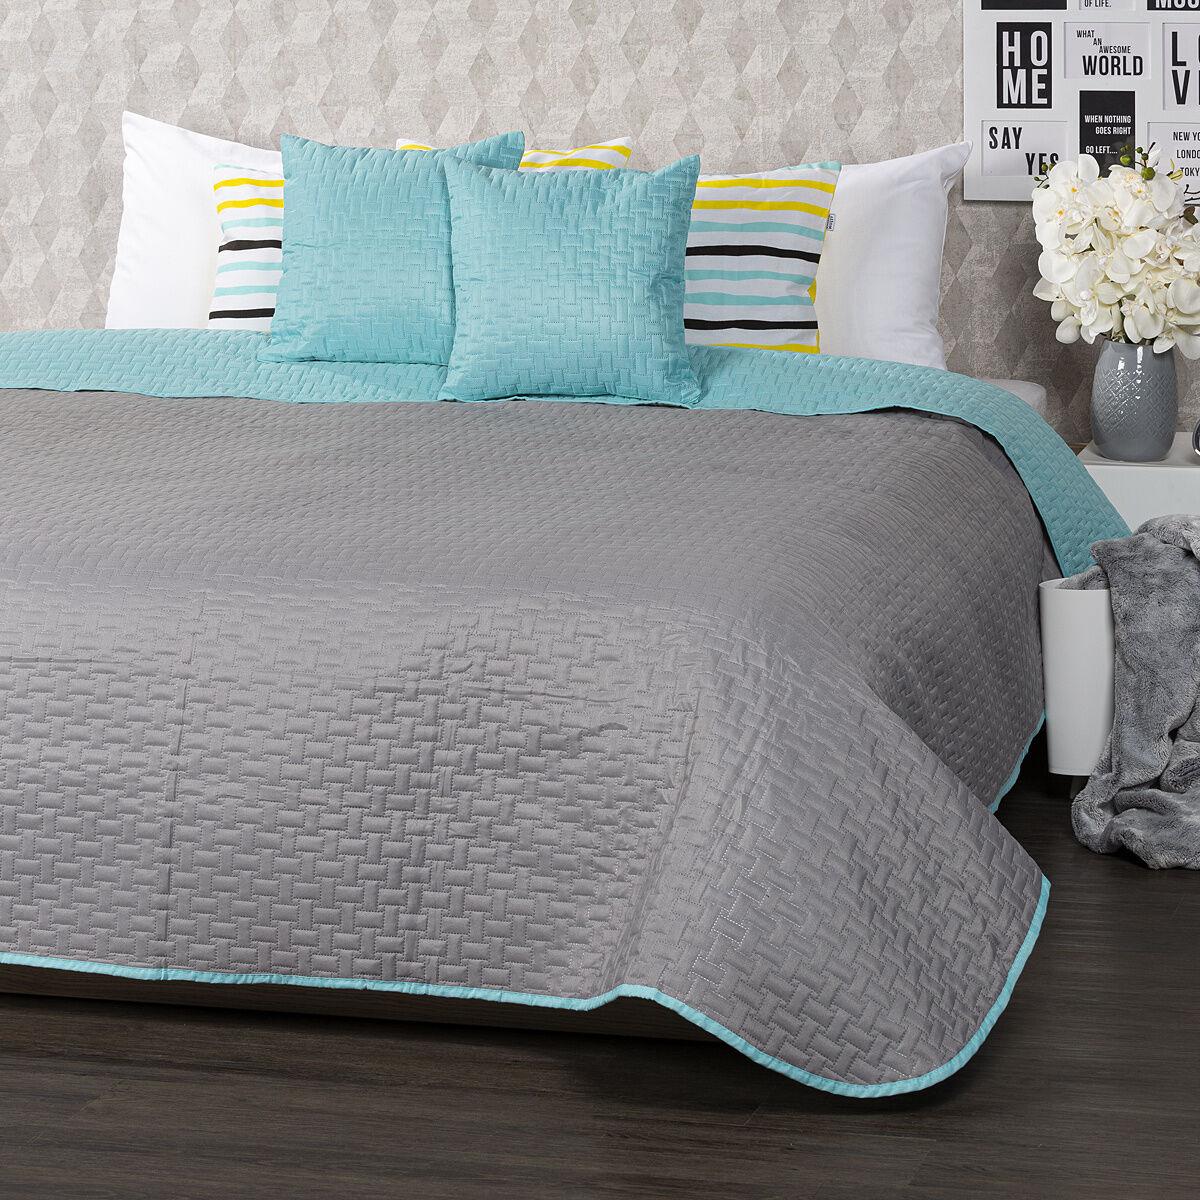 4Home Narzuta na łóżko Doubleface turkusowa/szara, 220 x 240 cm, 2 szt. 40 x 40 cm